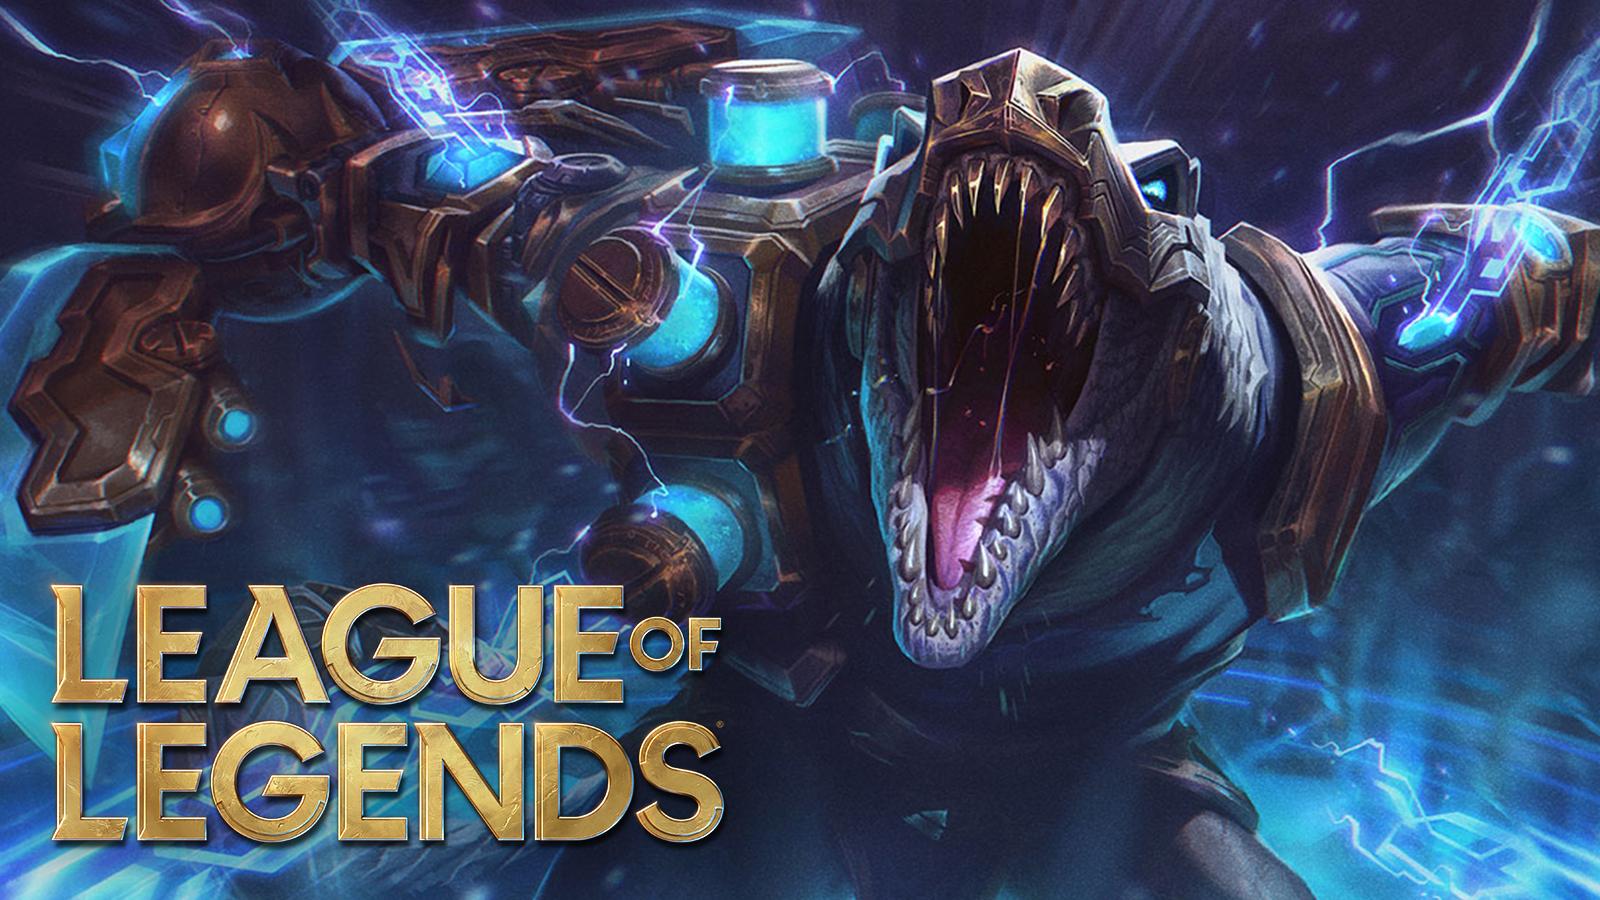 Hextech Renekton stands over League of Legends patch 11.4 notes.